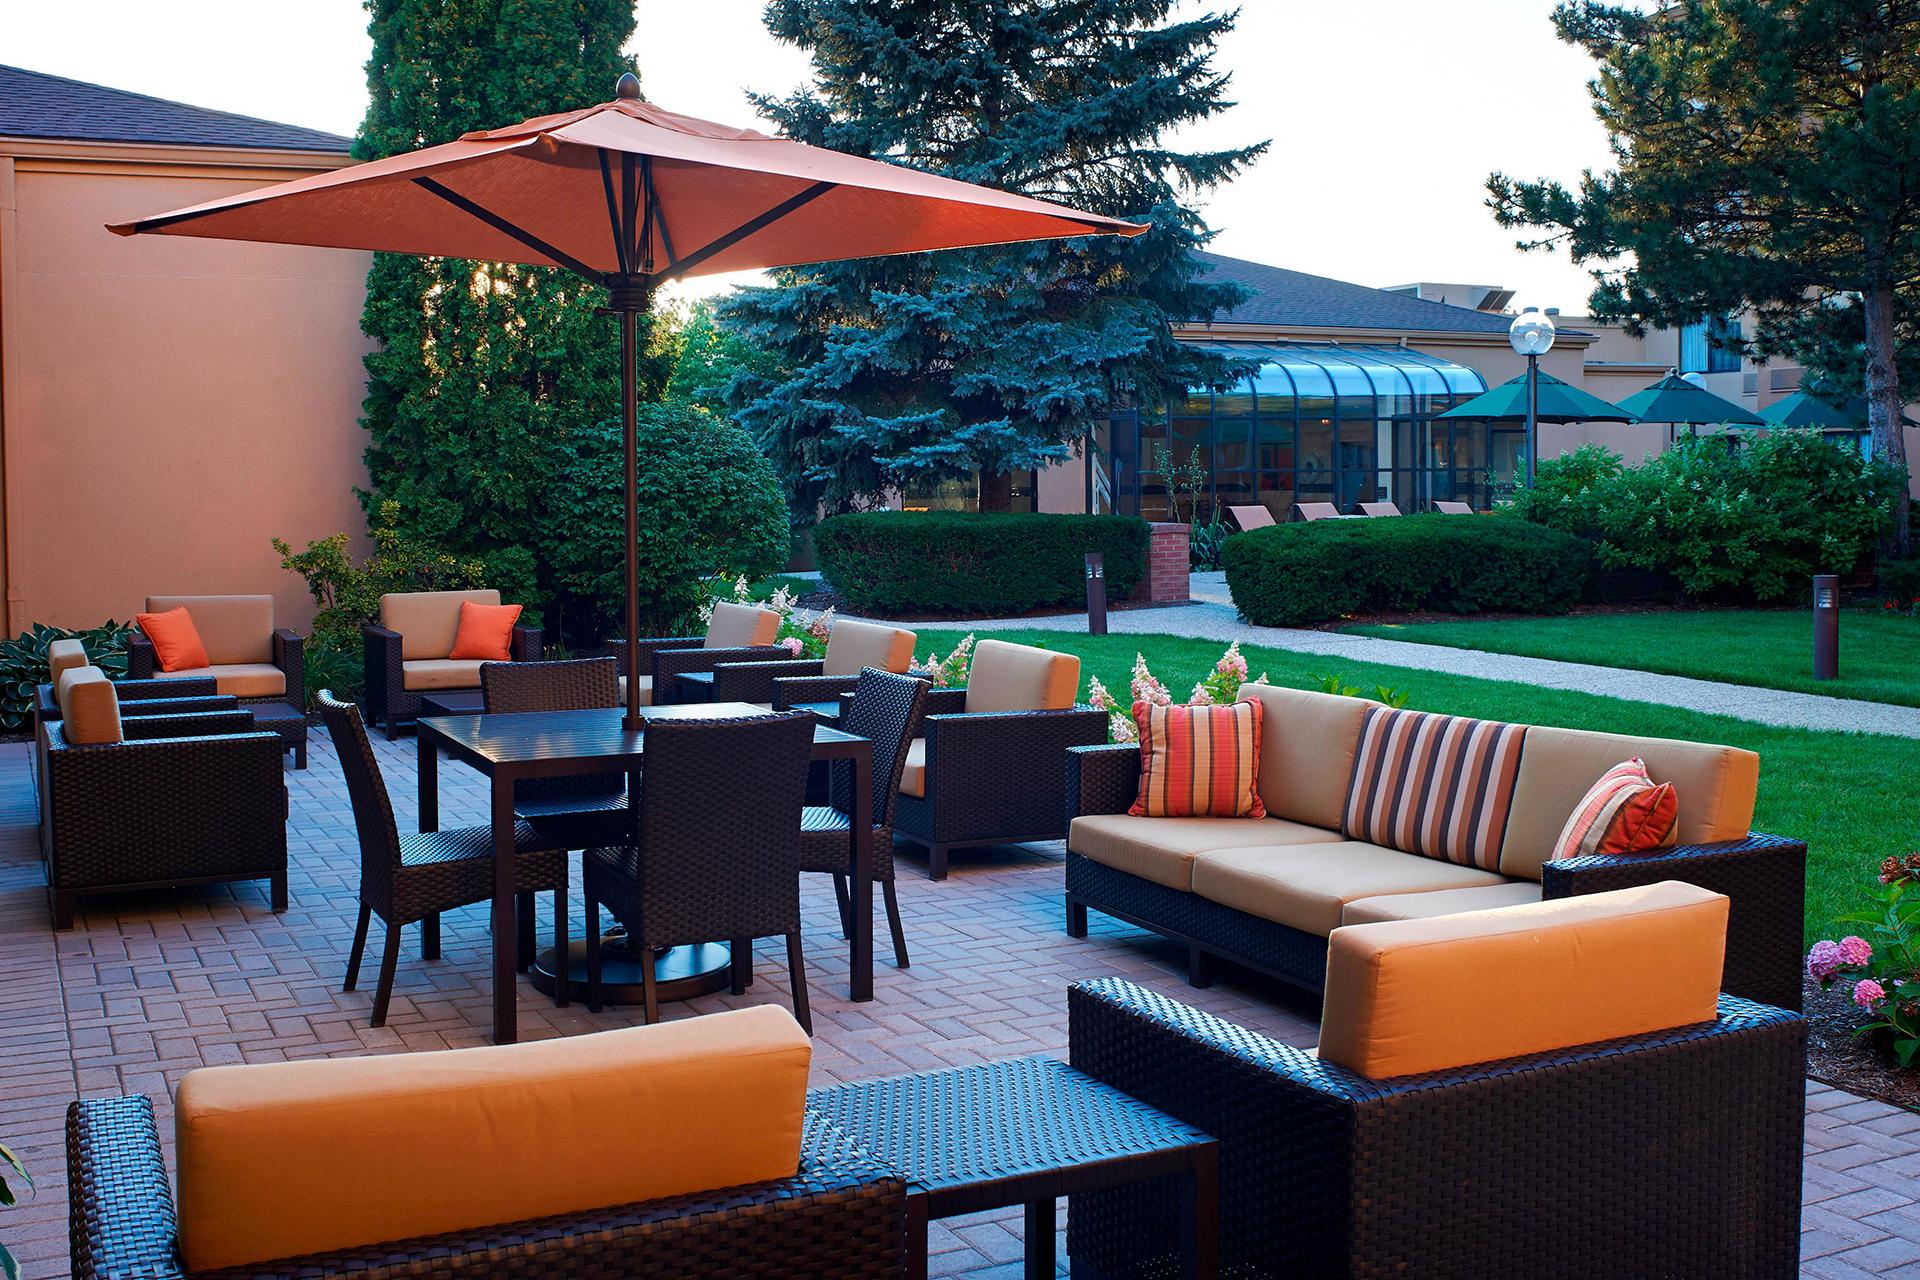 Sonesta Select Arlington Heights Outdoor Patio